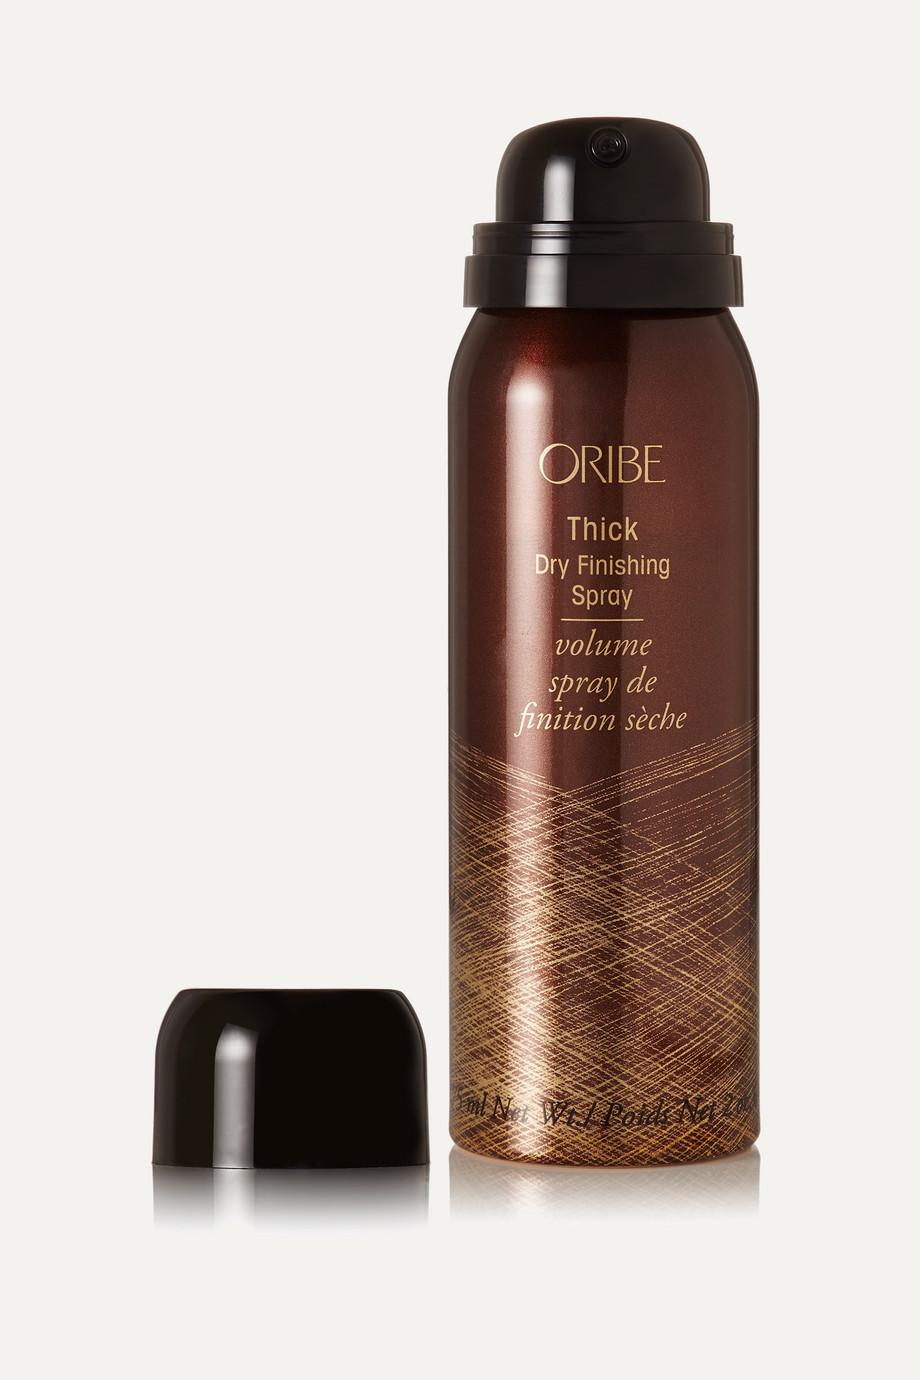 Oribe Thick Dry Finishing Spray, 75ml